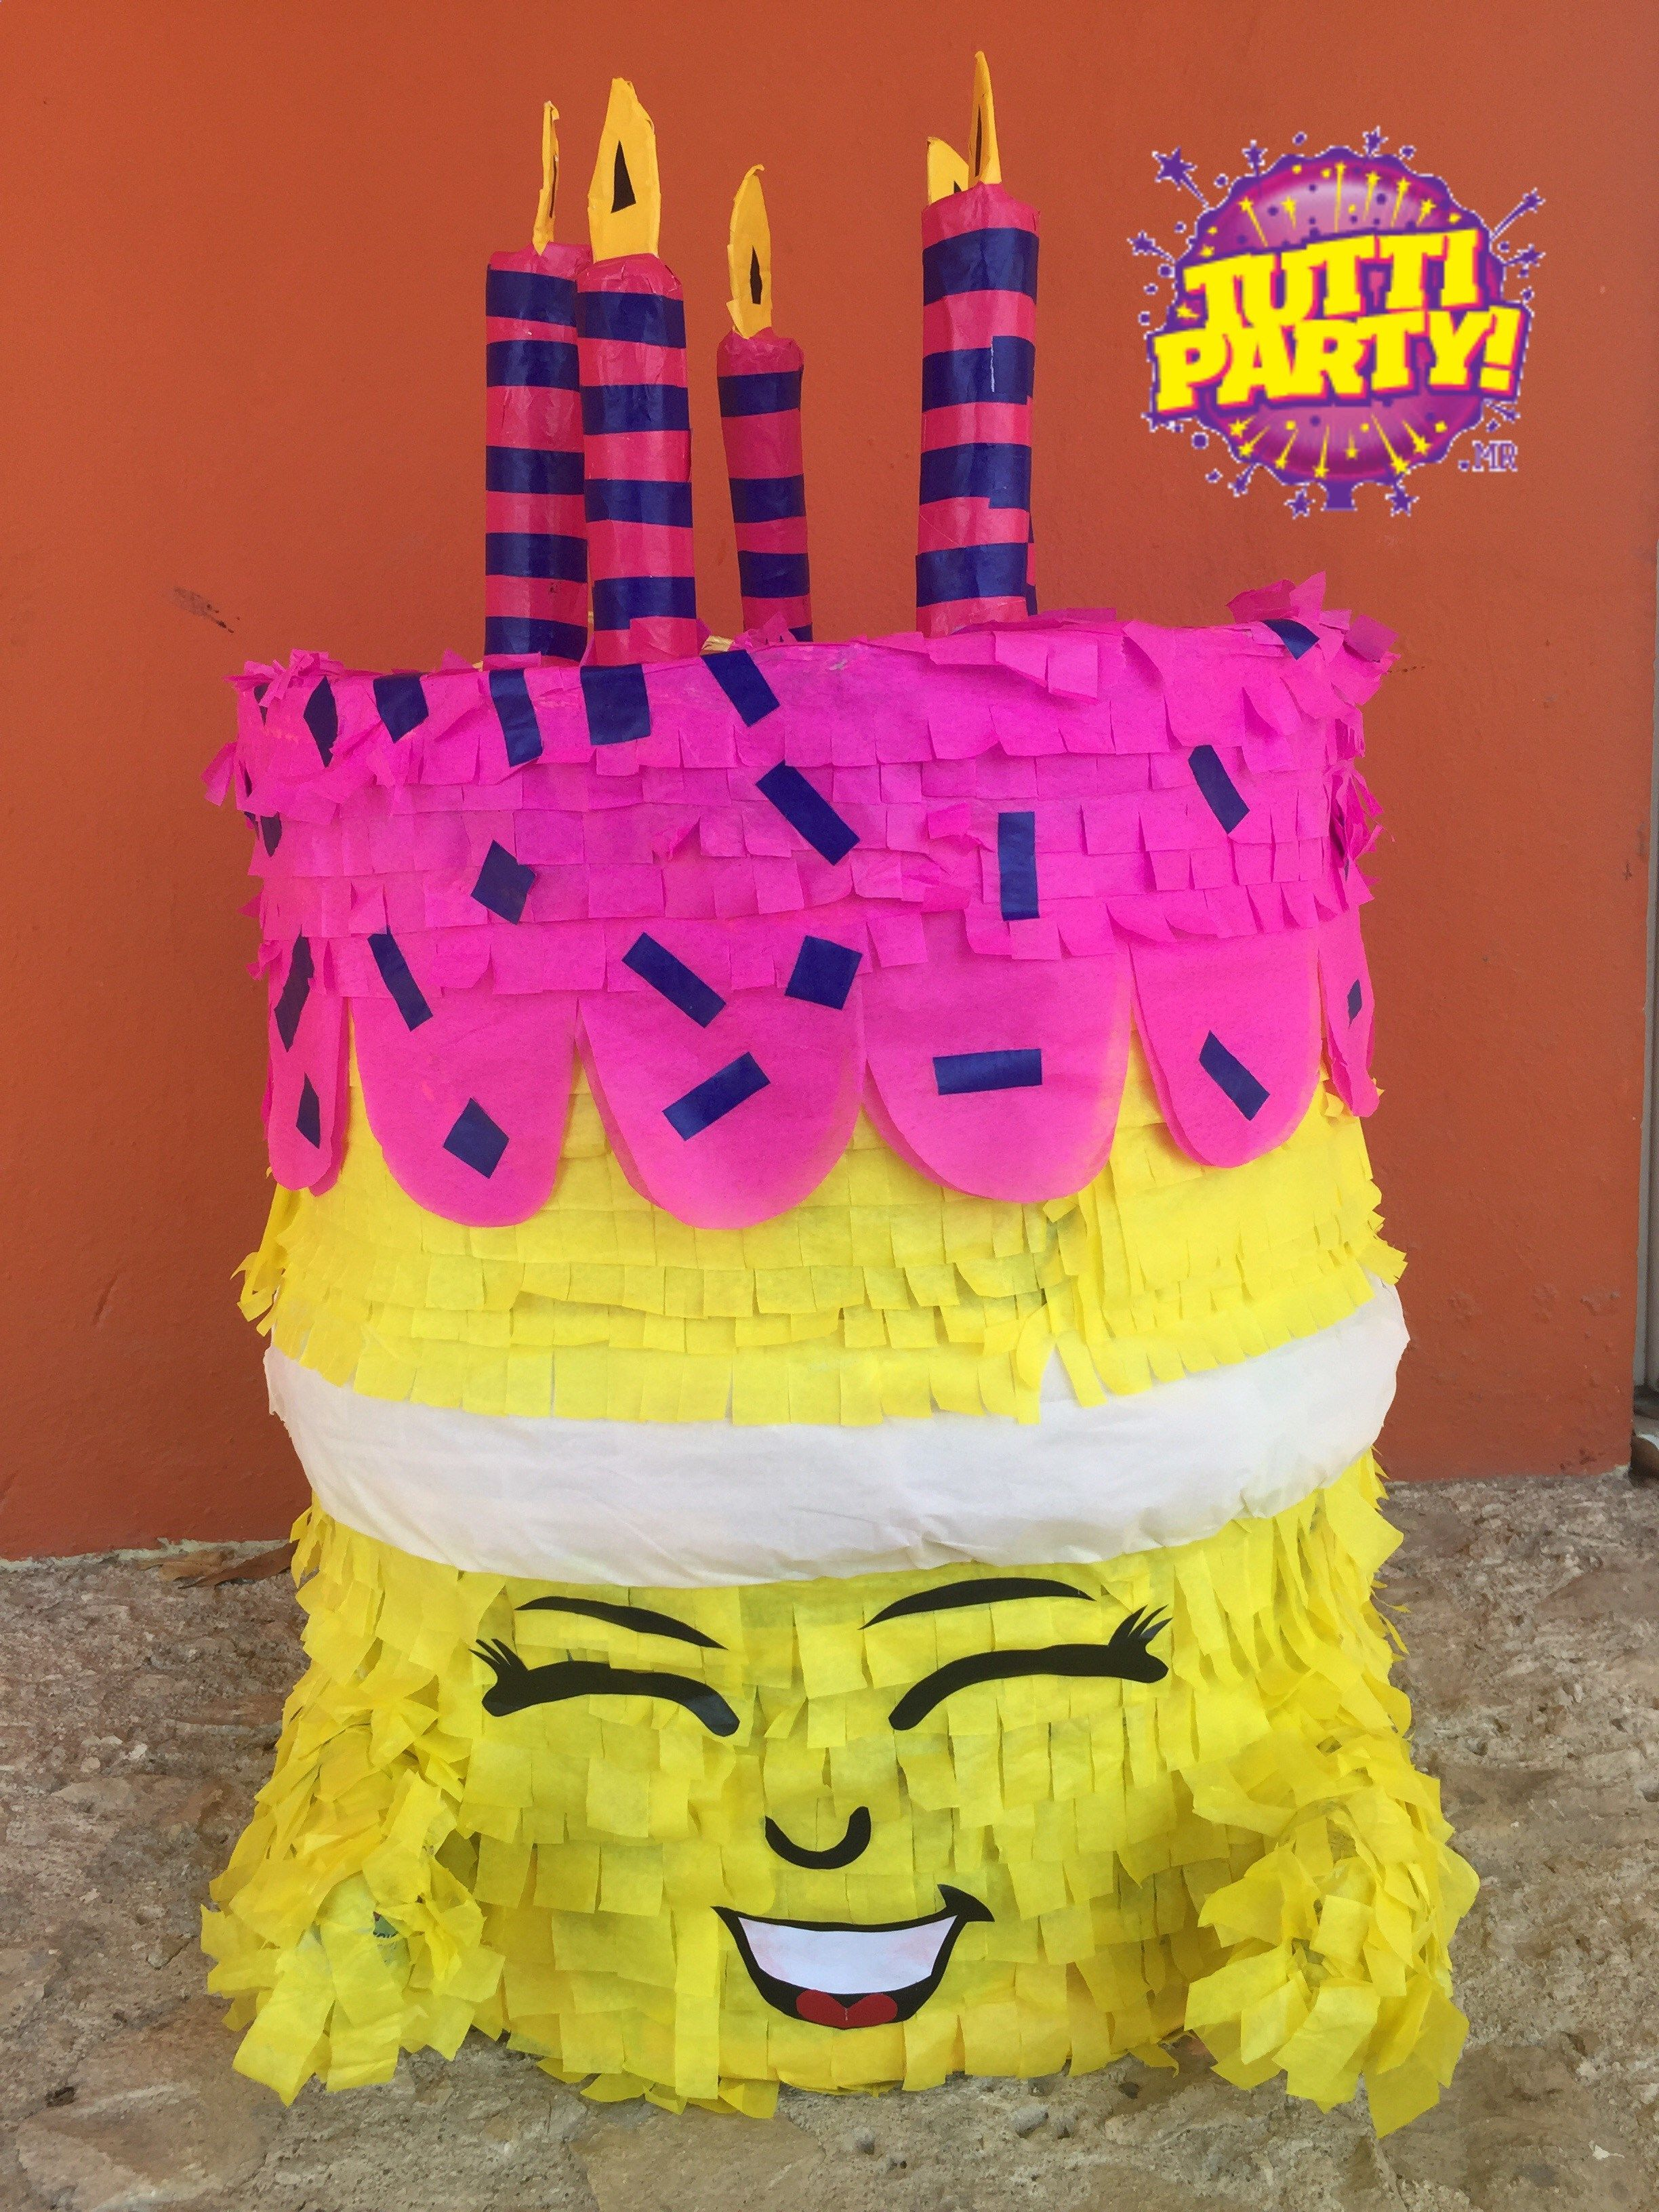 Shopkins piata Tutti Party playa del carmen